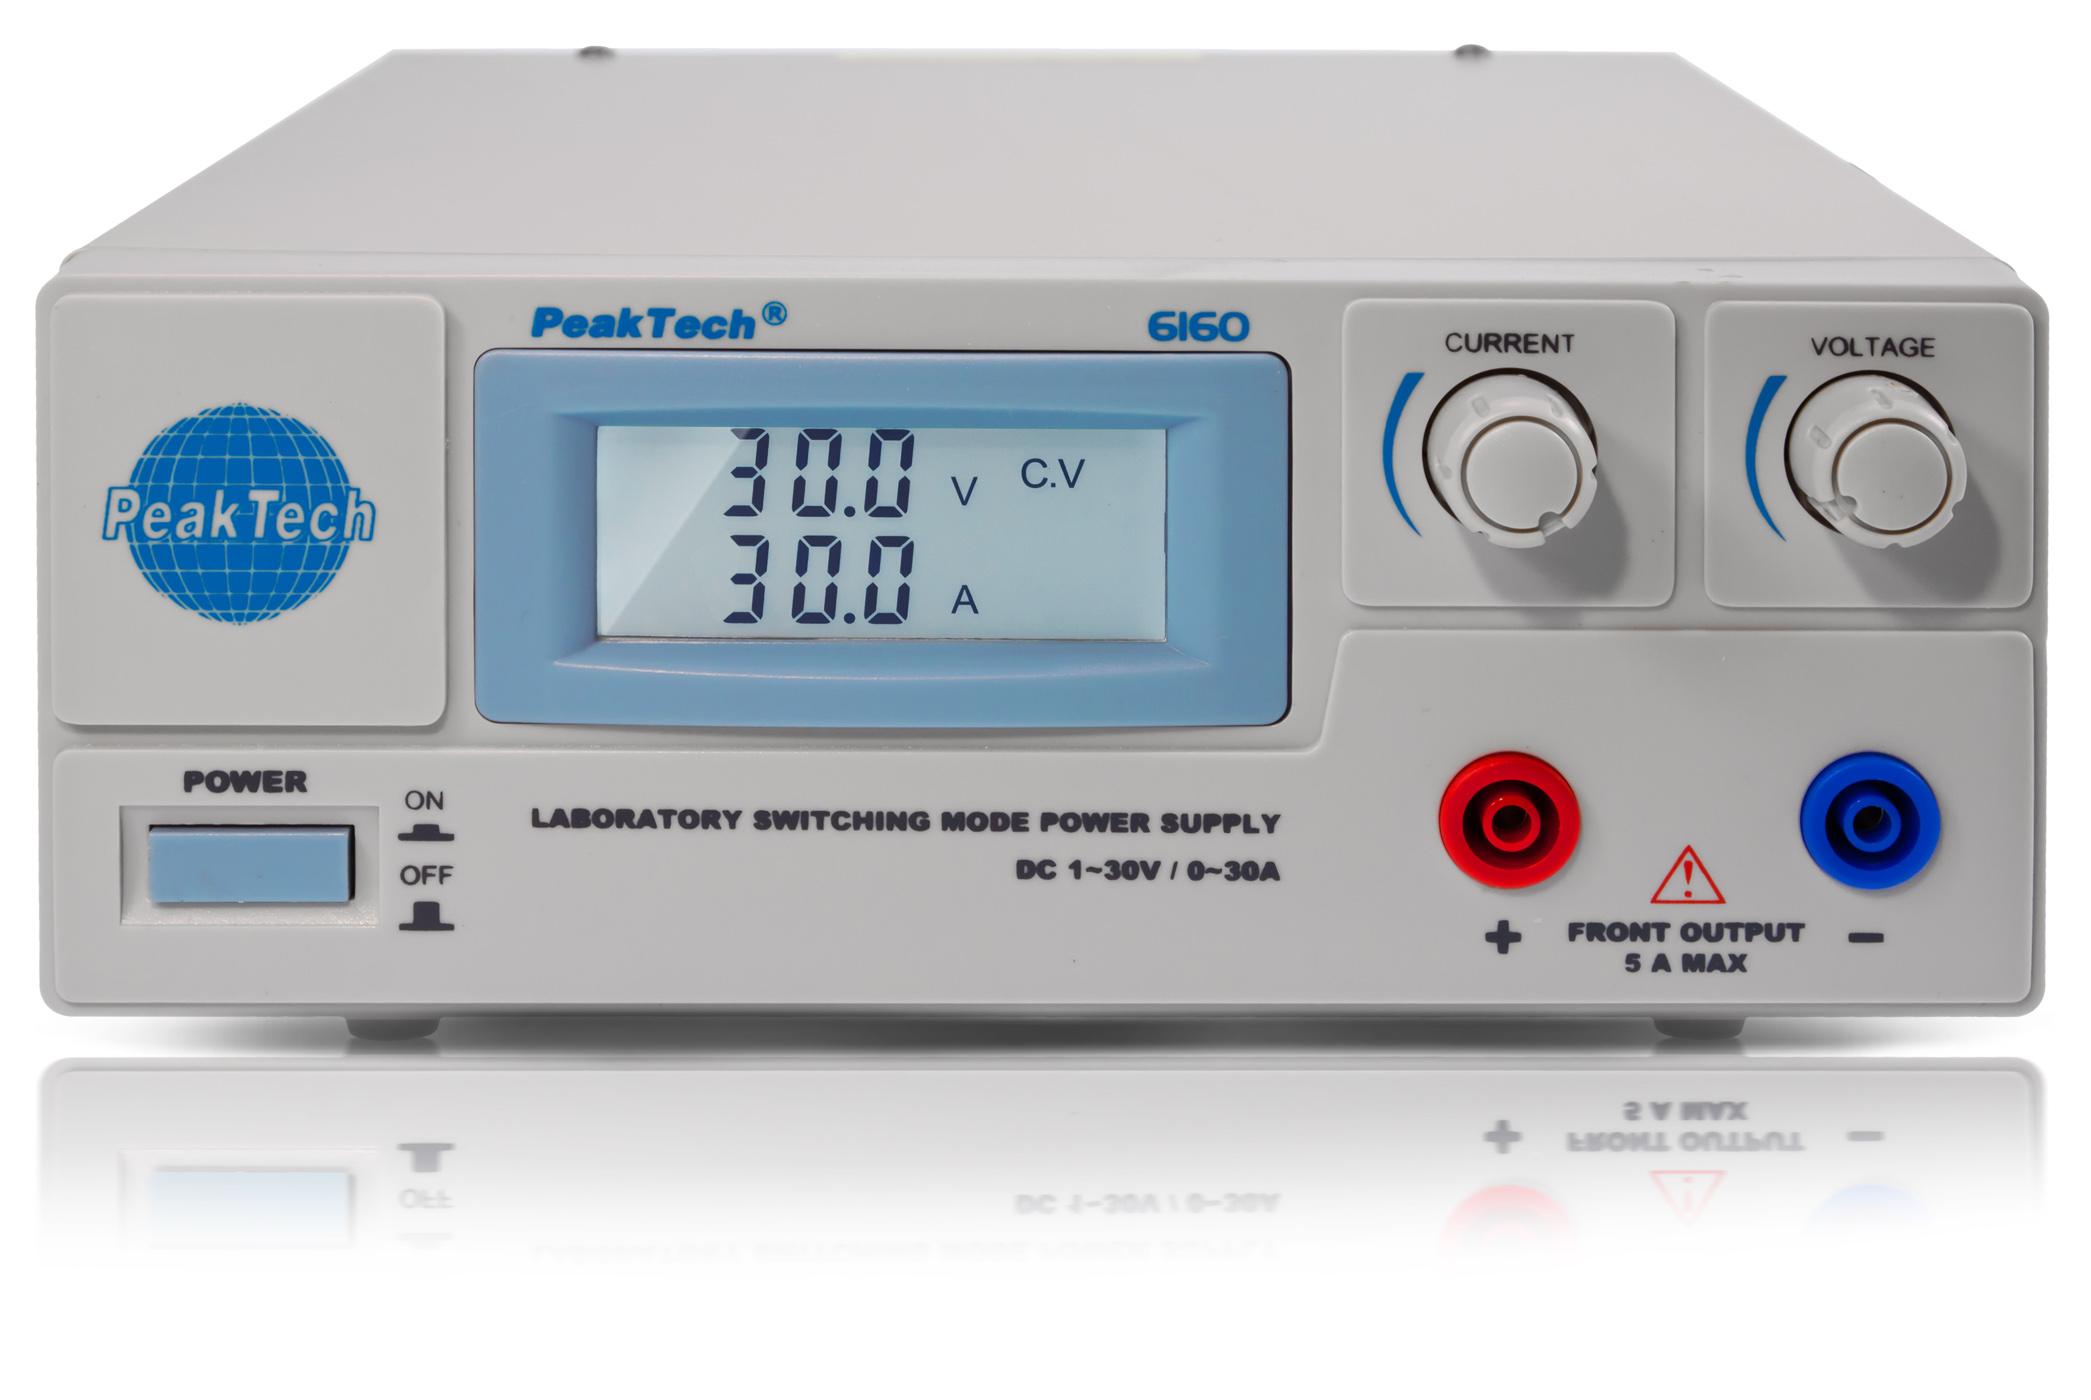 «PeakTech® P 6160» Laboratory Switching Mode Power Supply